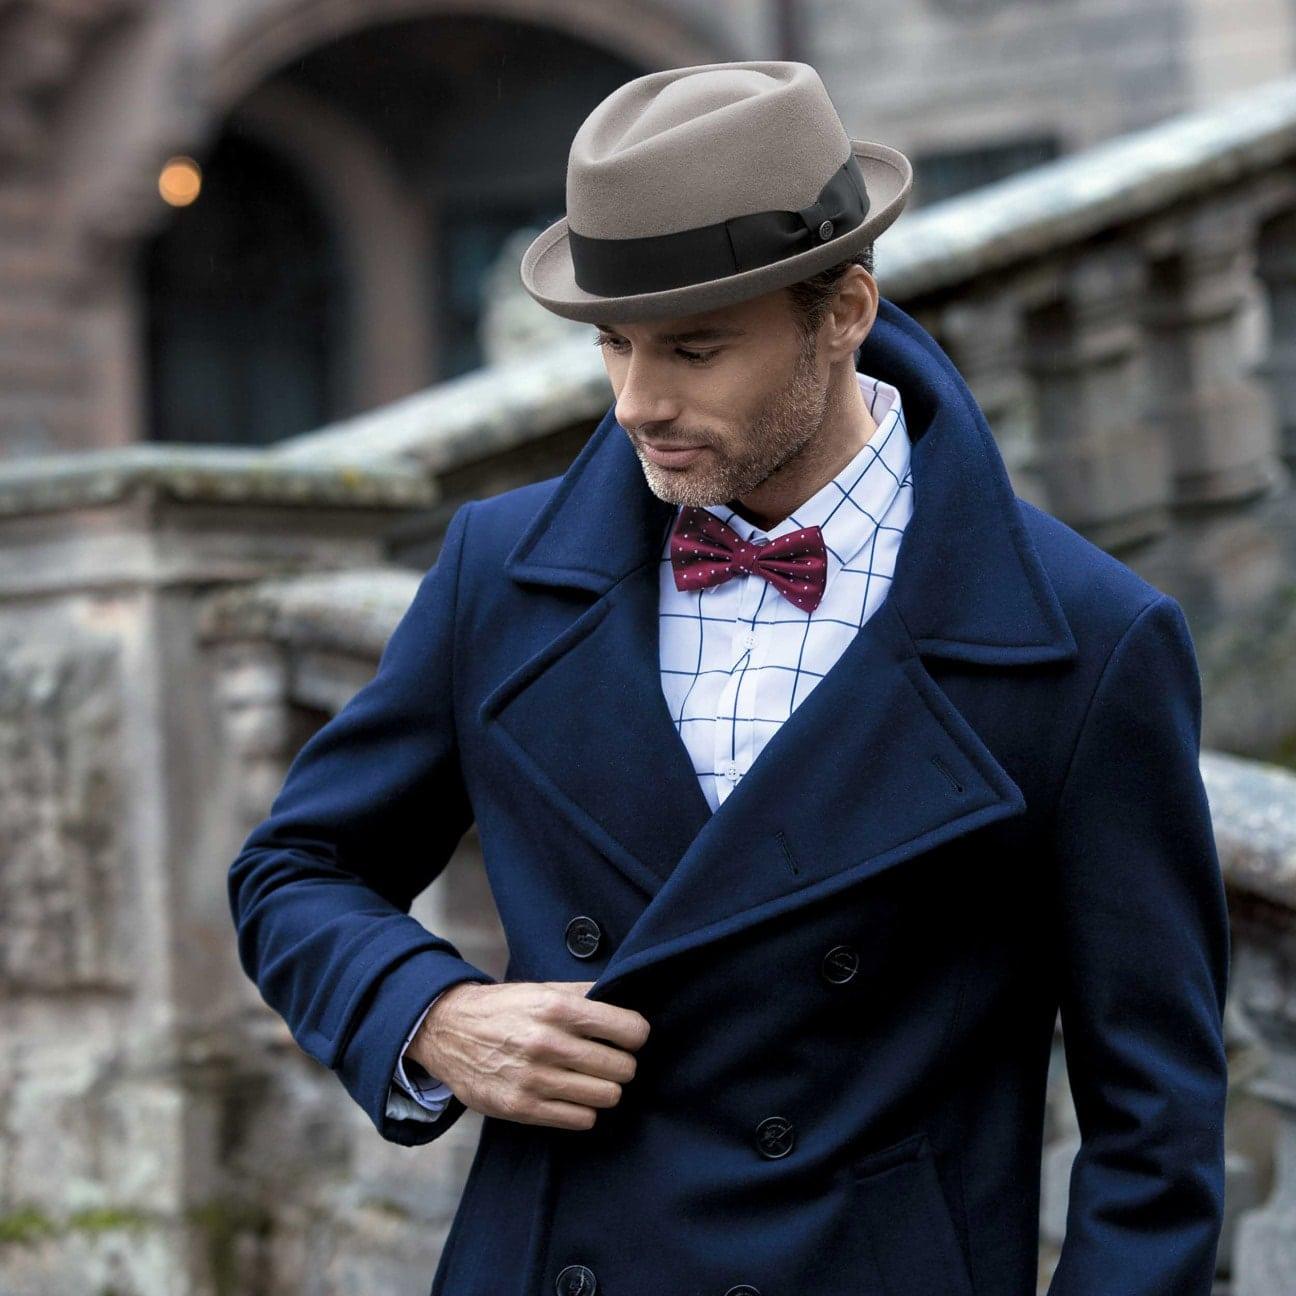 81b342061c7 ... Reighsbury Porkpie Hat by bugatti 1 ...